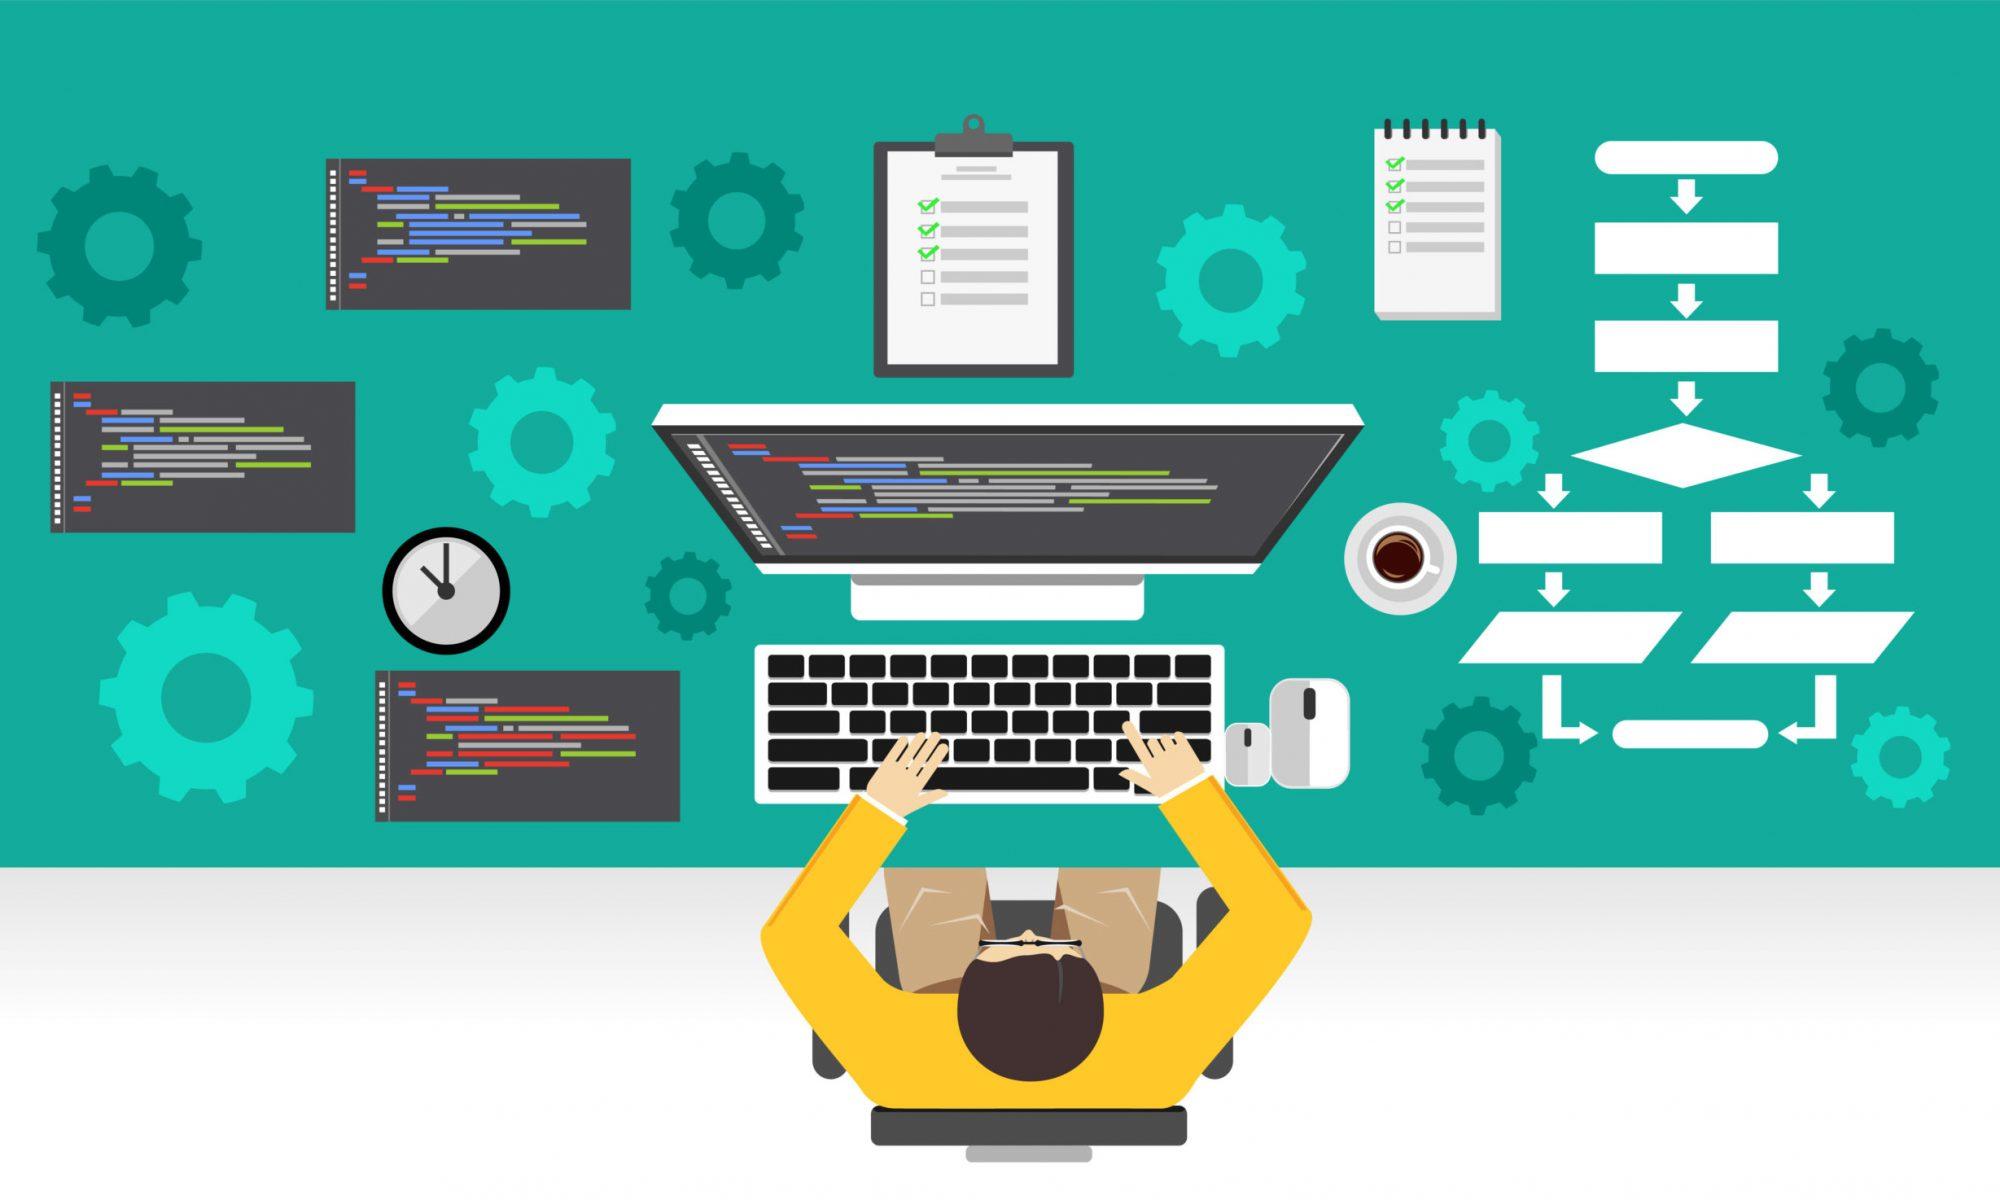 Software,Development.,Programmer,Working,On,Computer.,Programming,Mechanism,Concept.